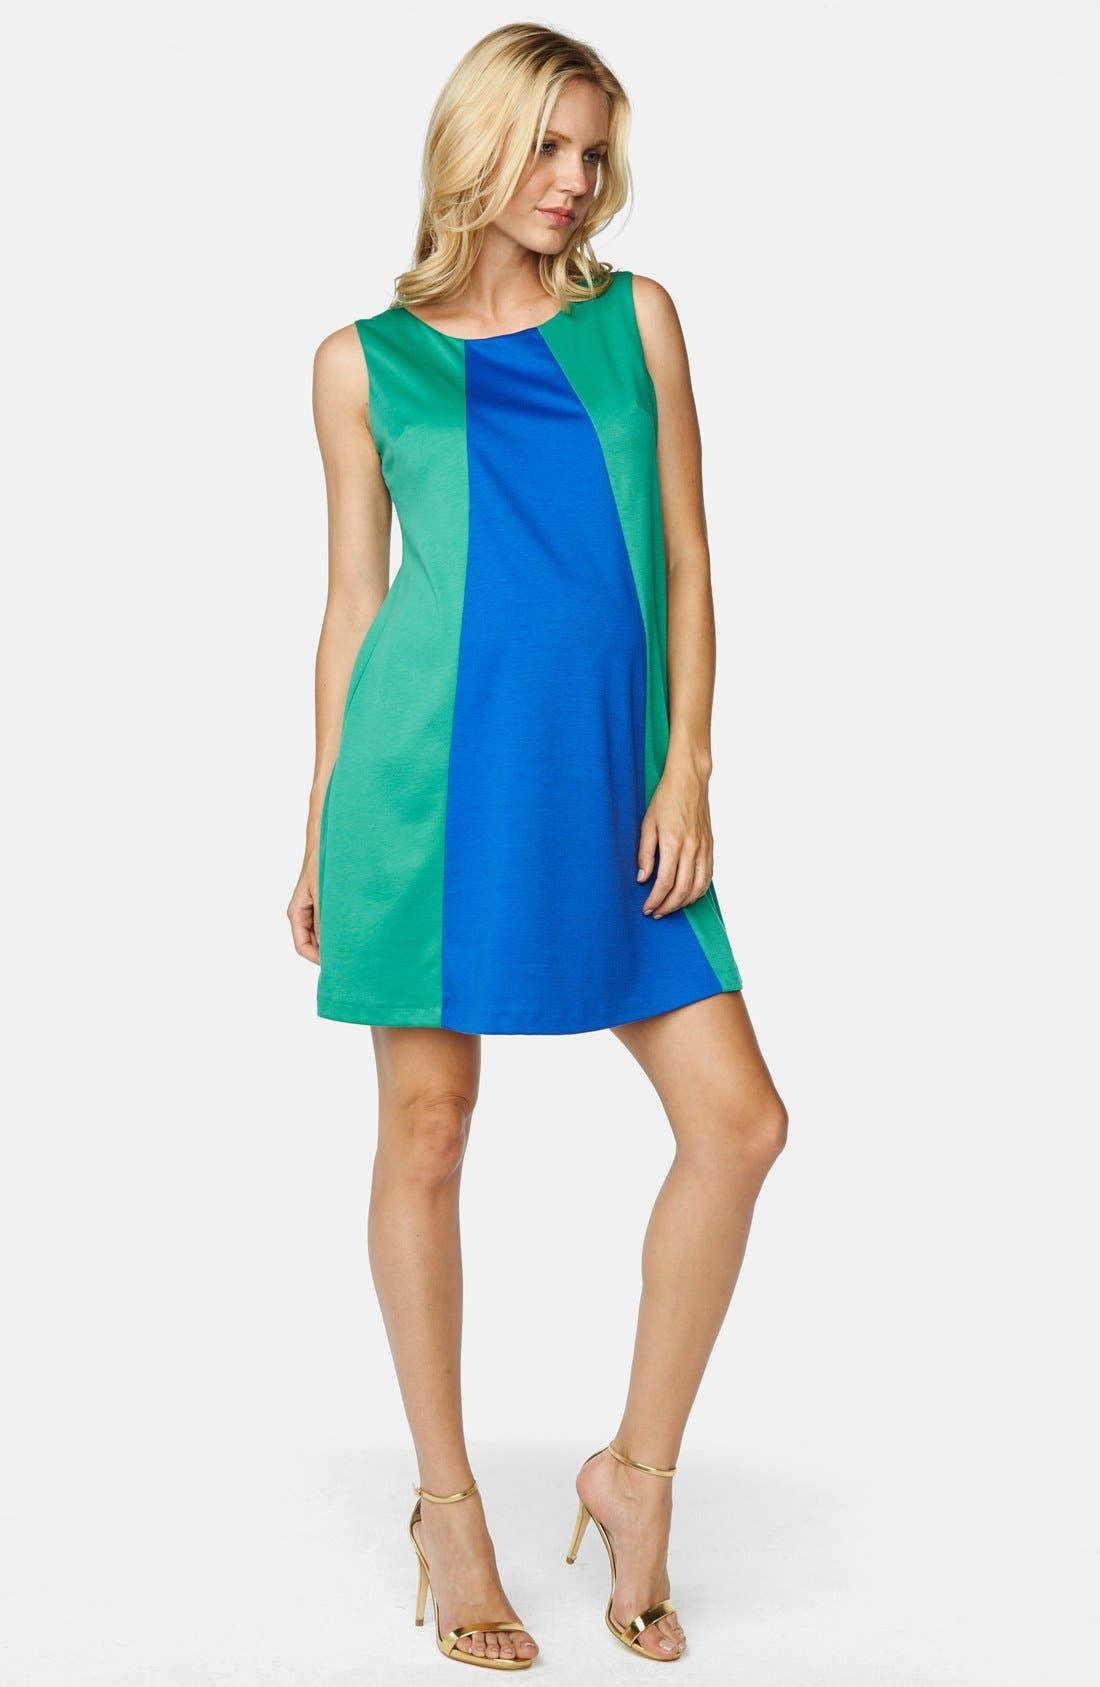 MATERNAL AMERICA 'Pyramid' Maternity Dress, Main, color, EMERALD/ ROYAL BLUE